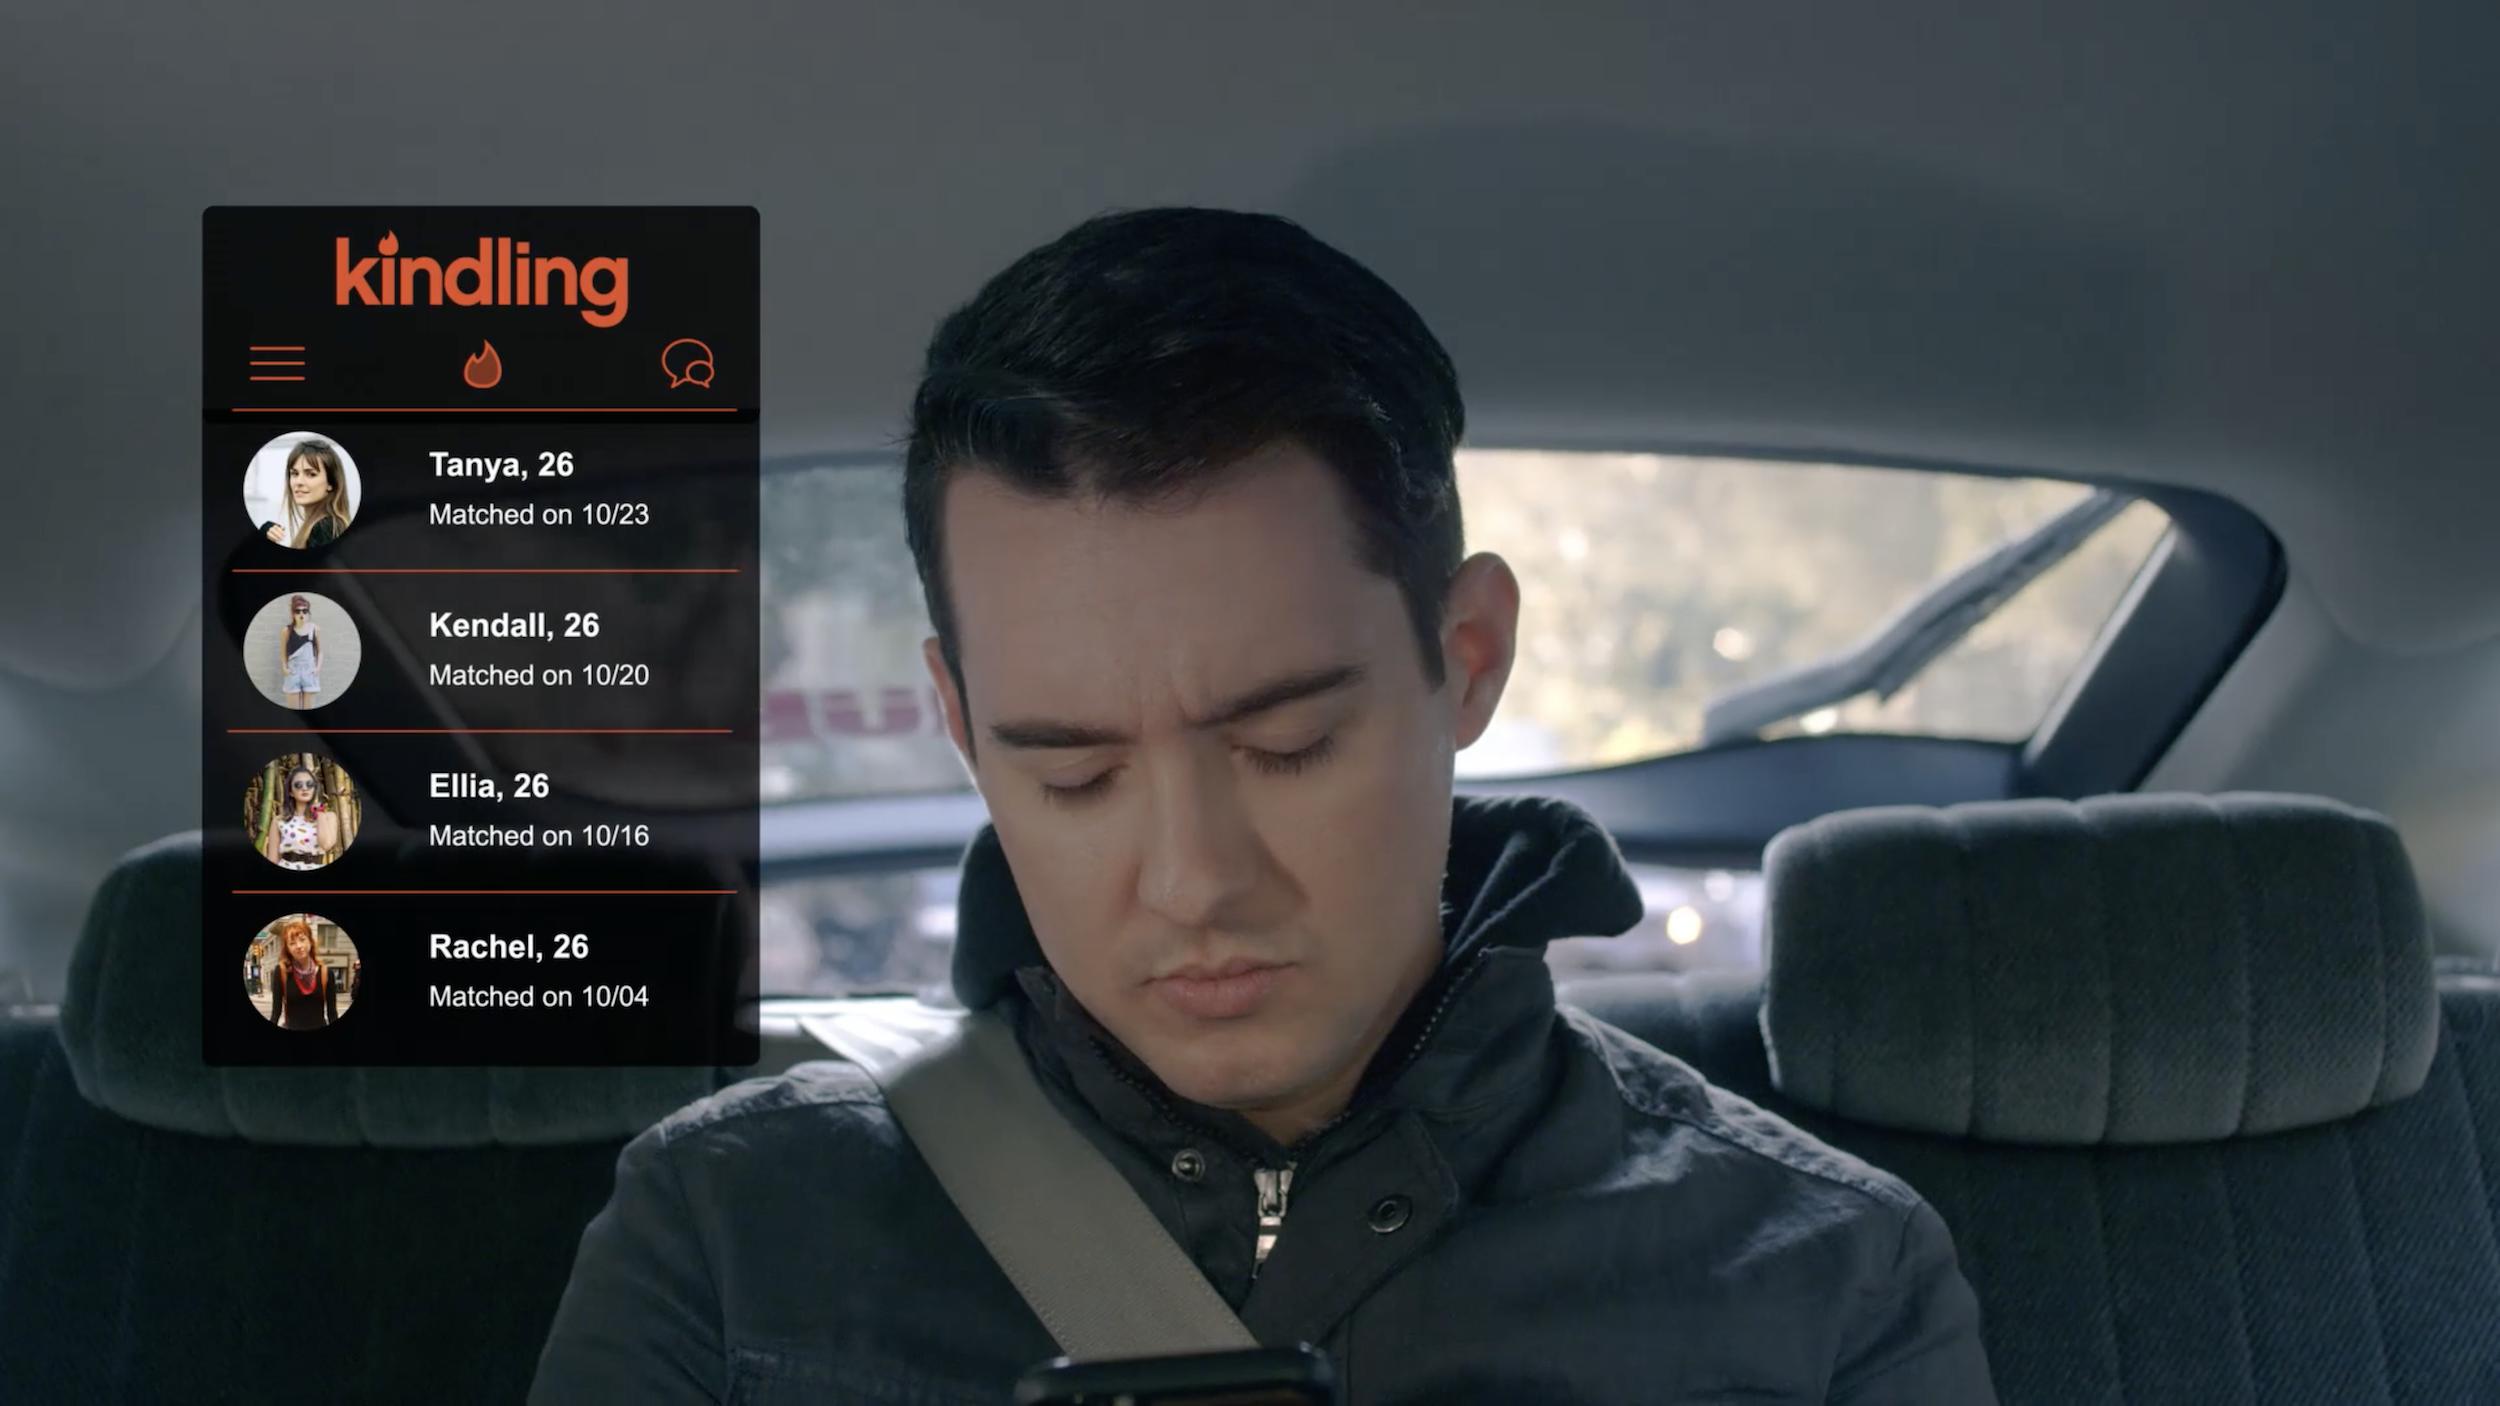 """Kindling"" matches UI"